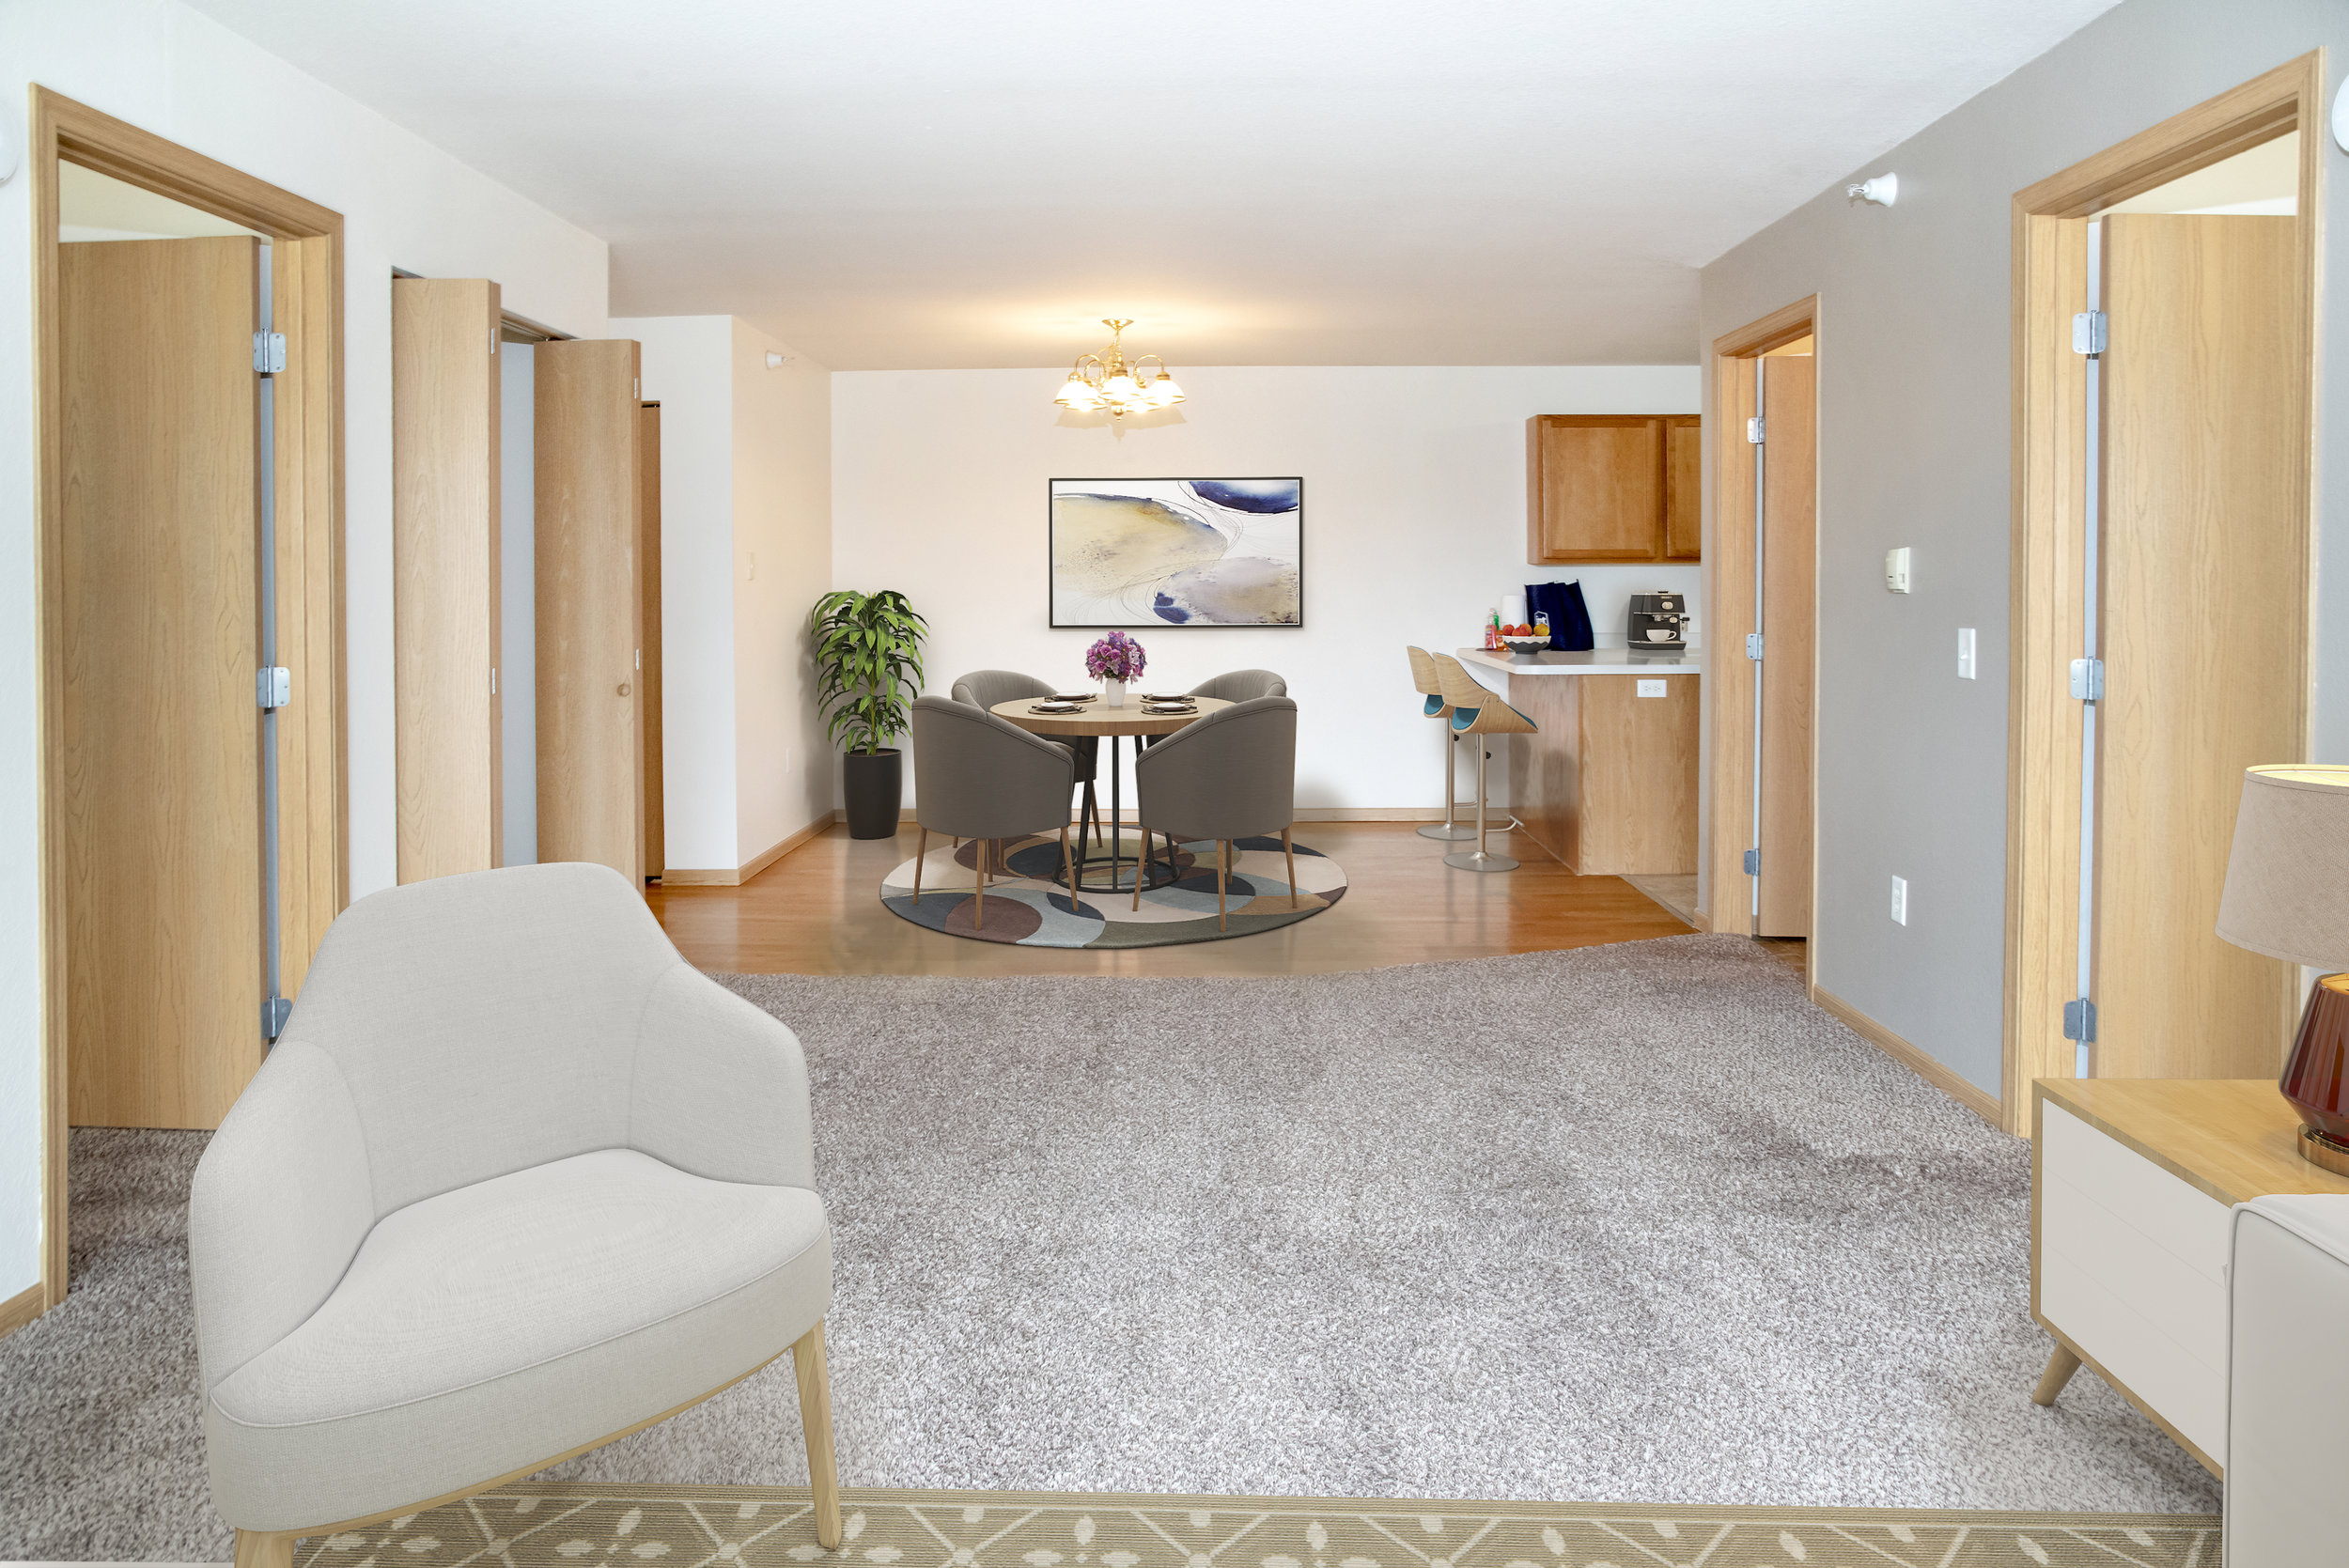 05-Living Area with Plenty of Natural Light.jpg